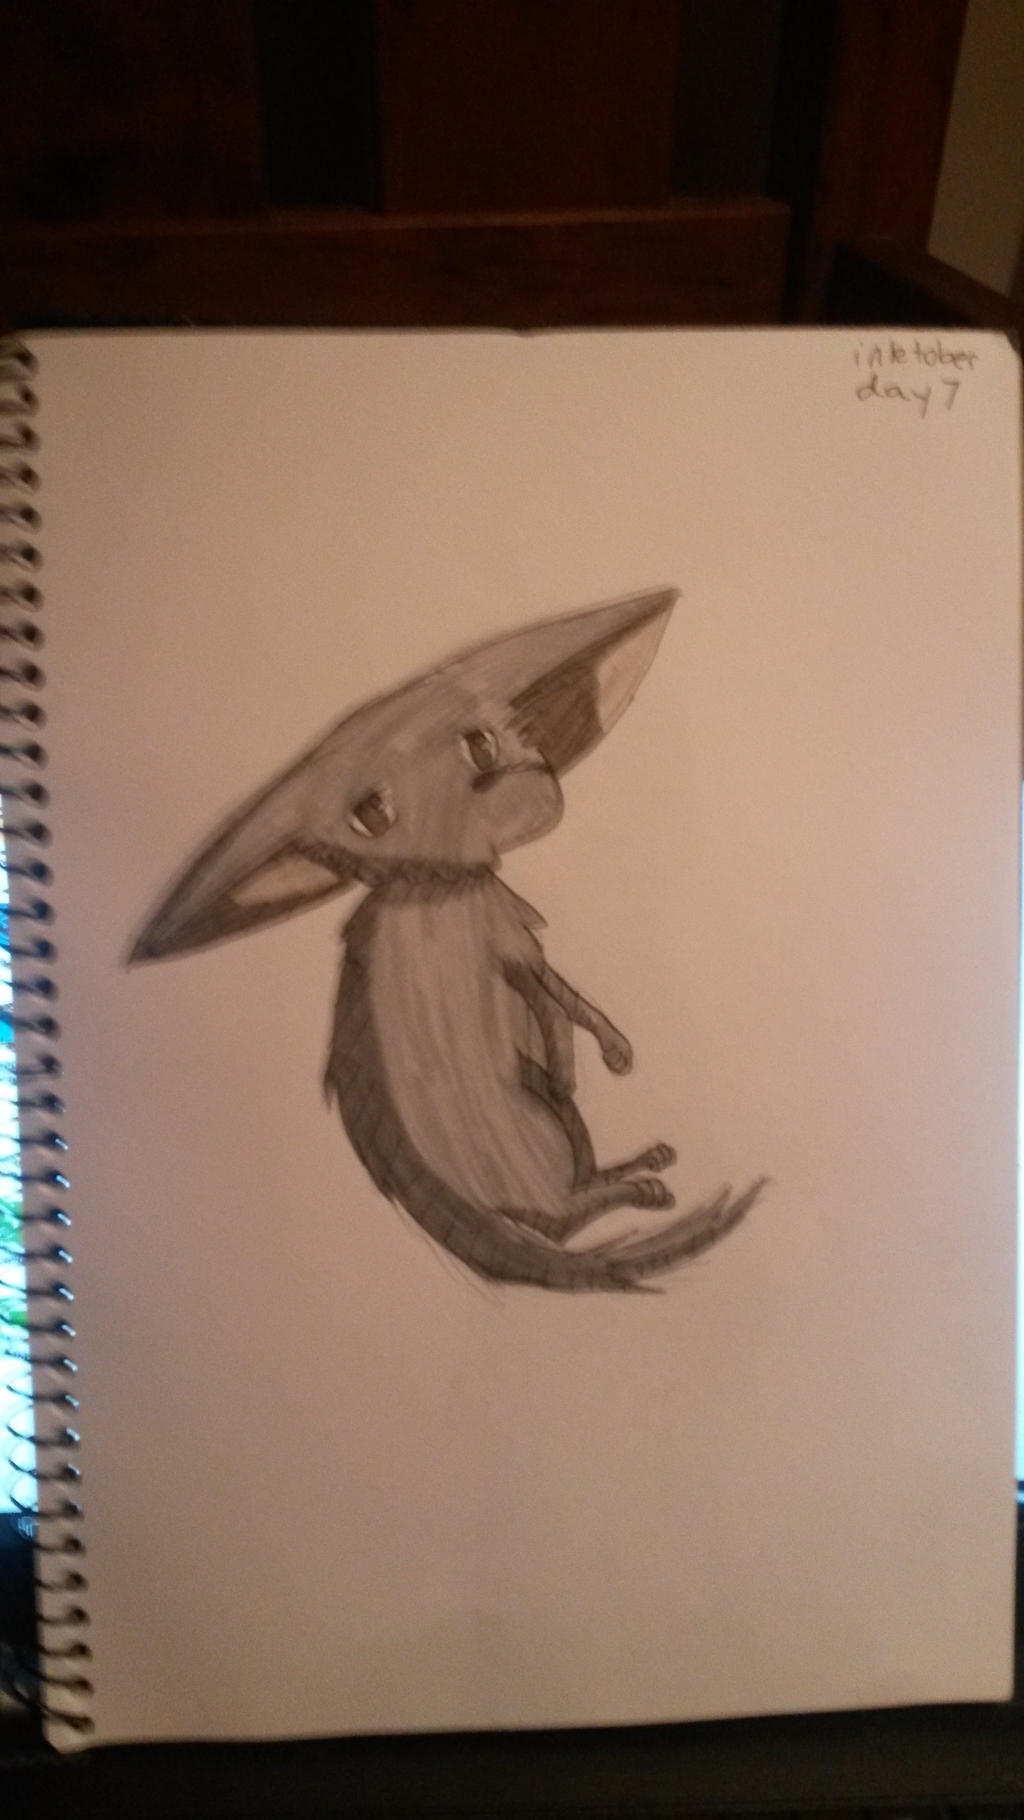 Inktober Day 7-Small Fox by zencat61